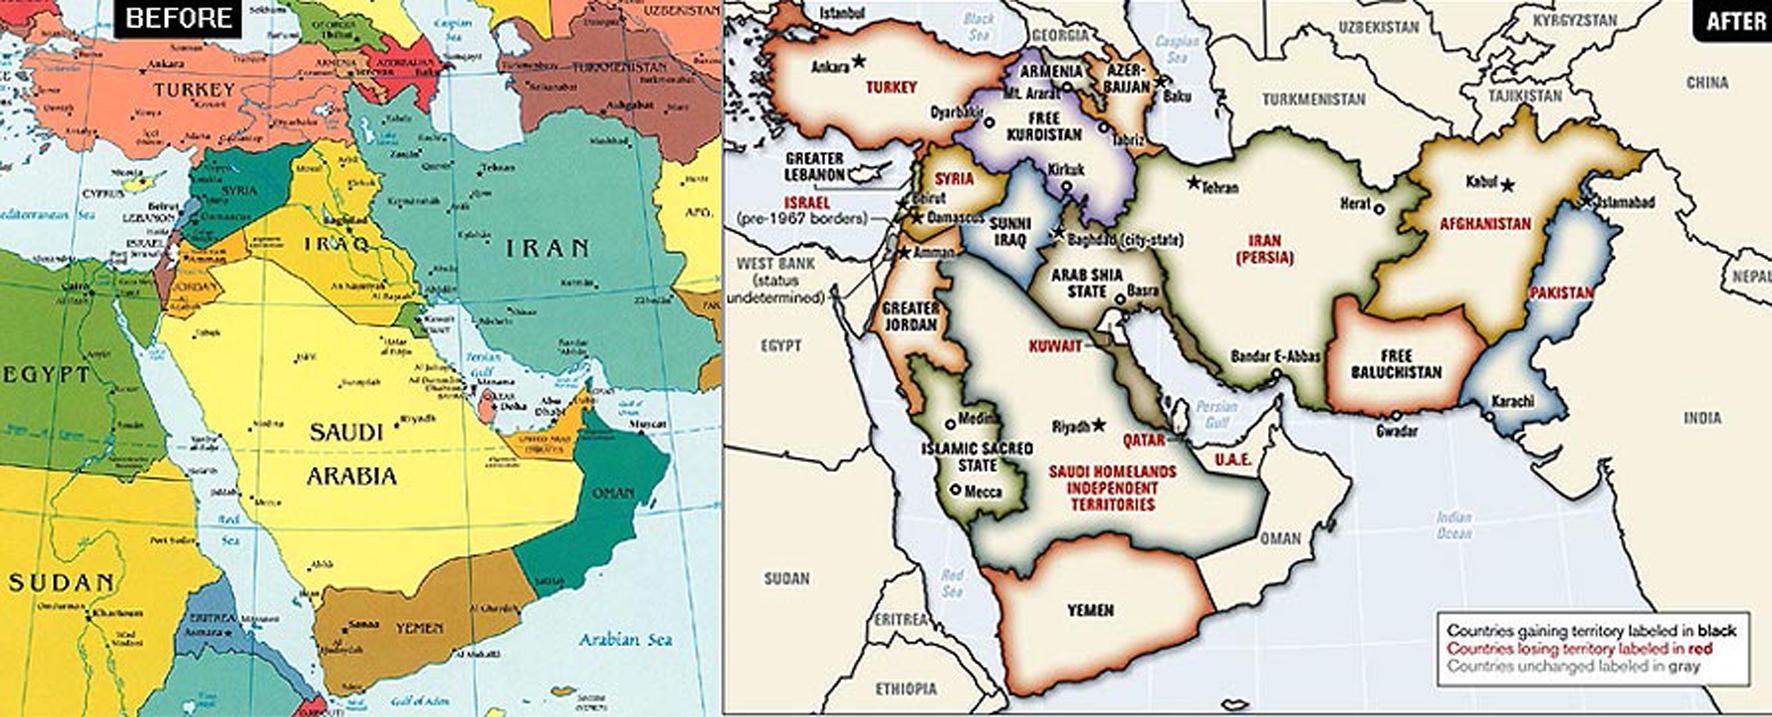 Israel Politics and News Thread 13158-6-tal_an_bol_an_tayau_sh_ru